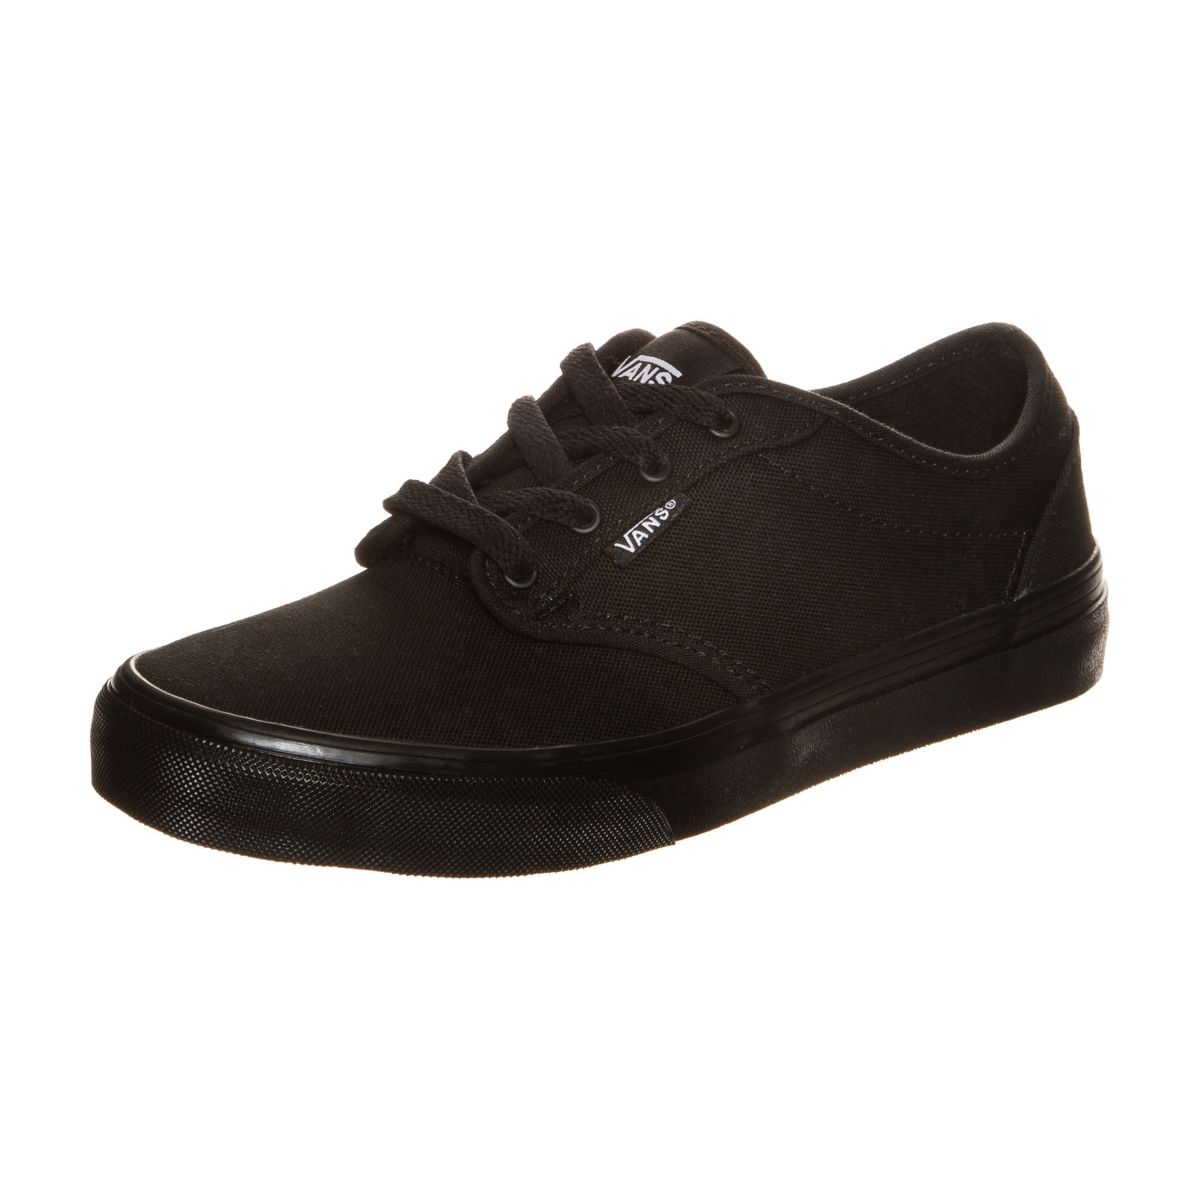 VANS Atwood Sneaker Kinder